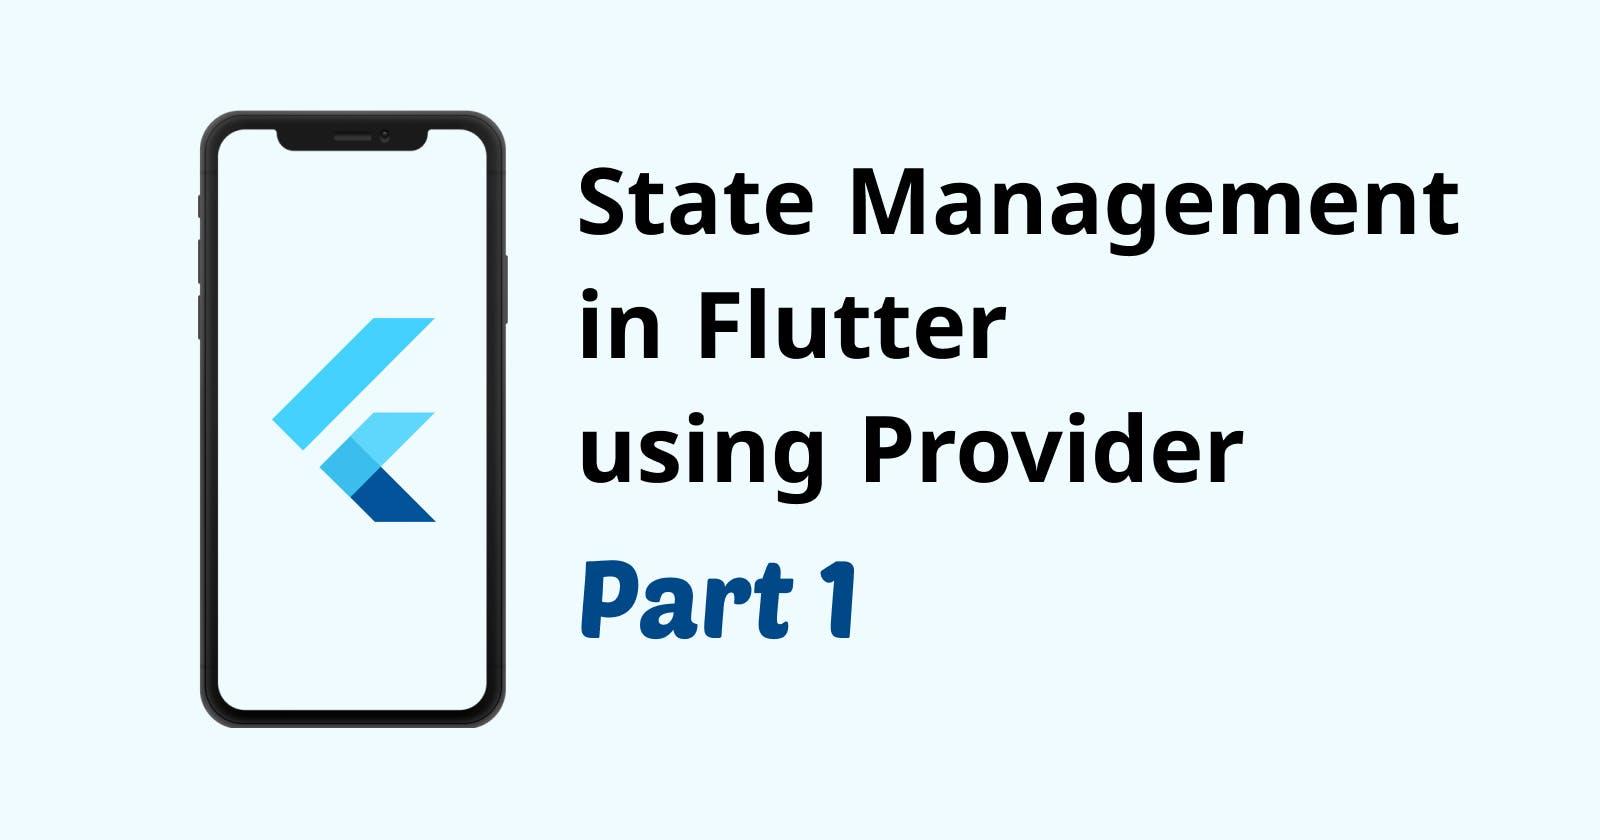 State Management in Flutter using Provider: Part 1